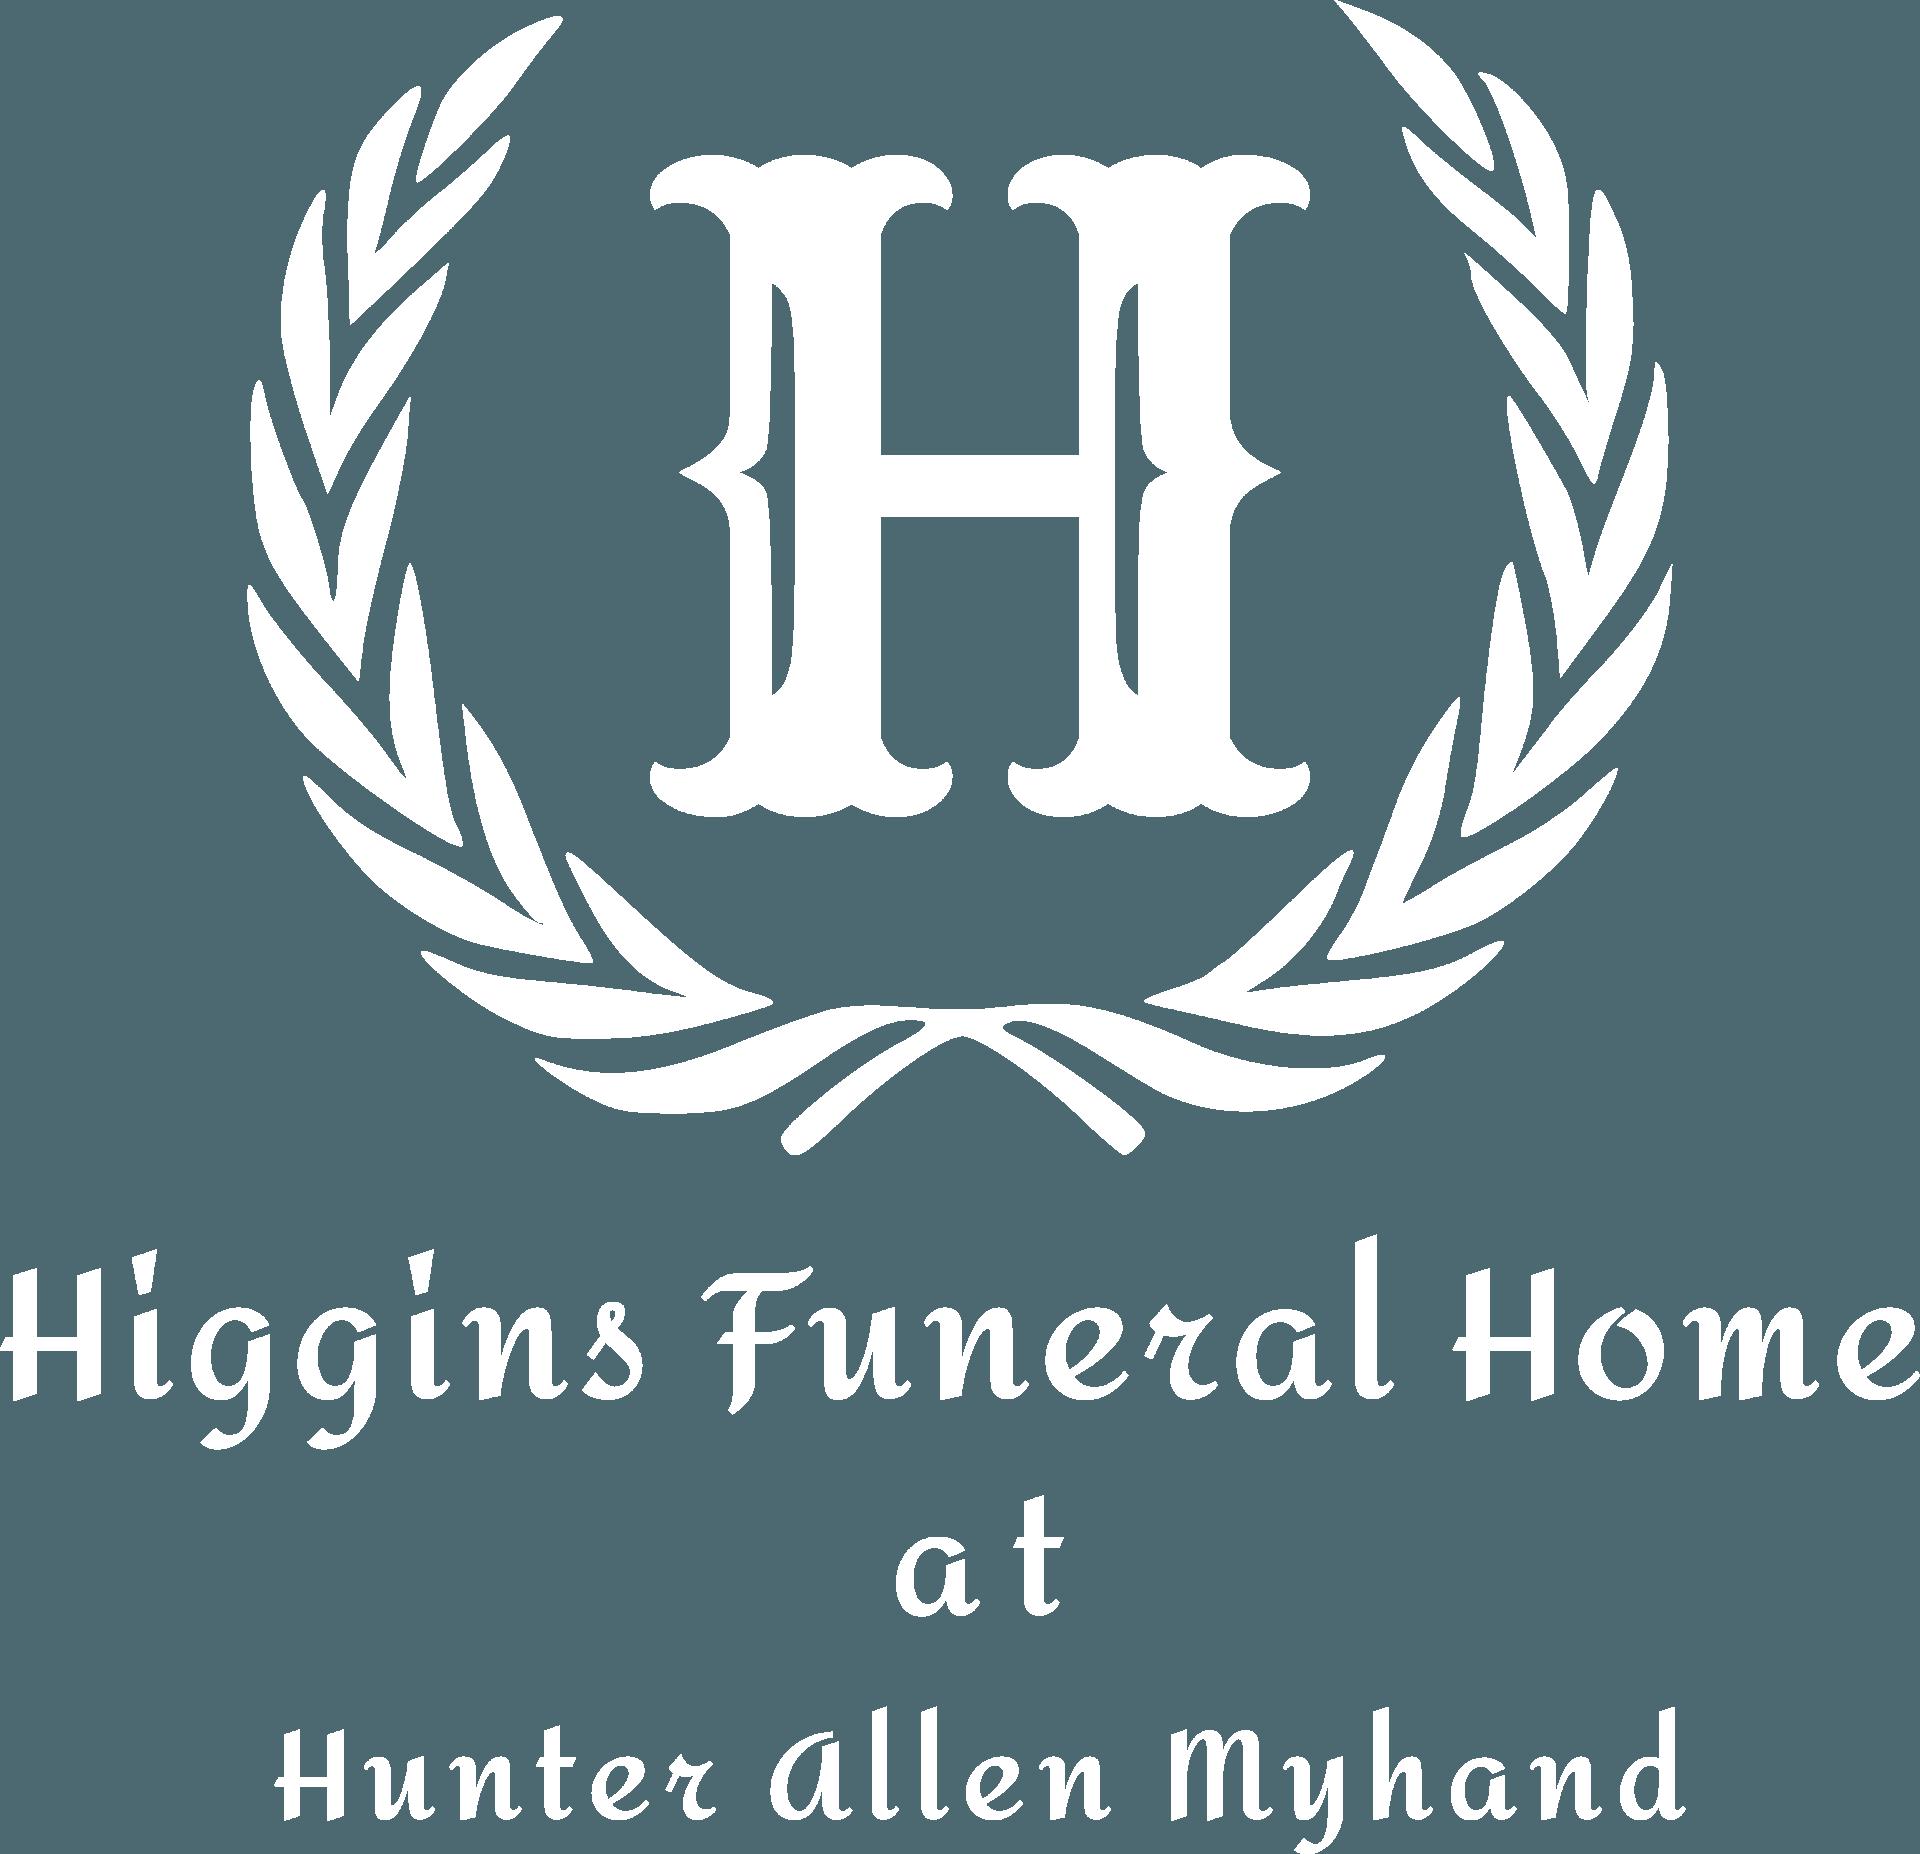 Higgins Funeral Home